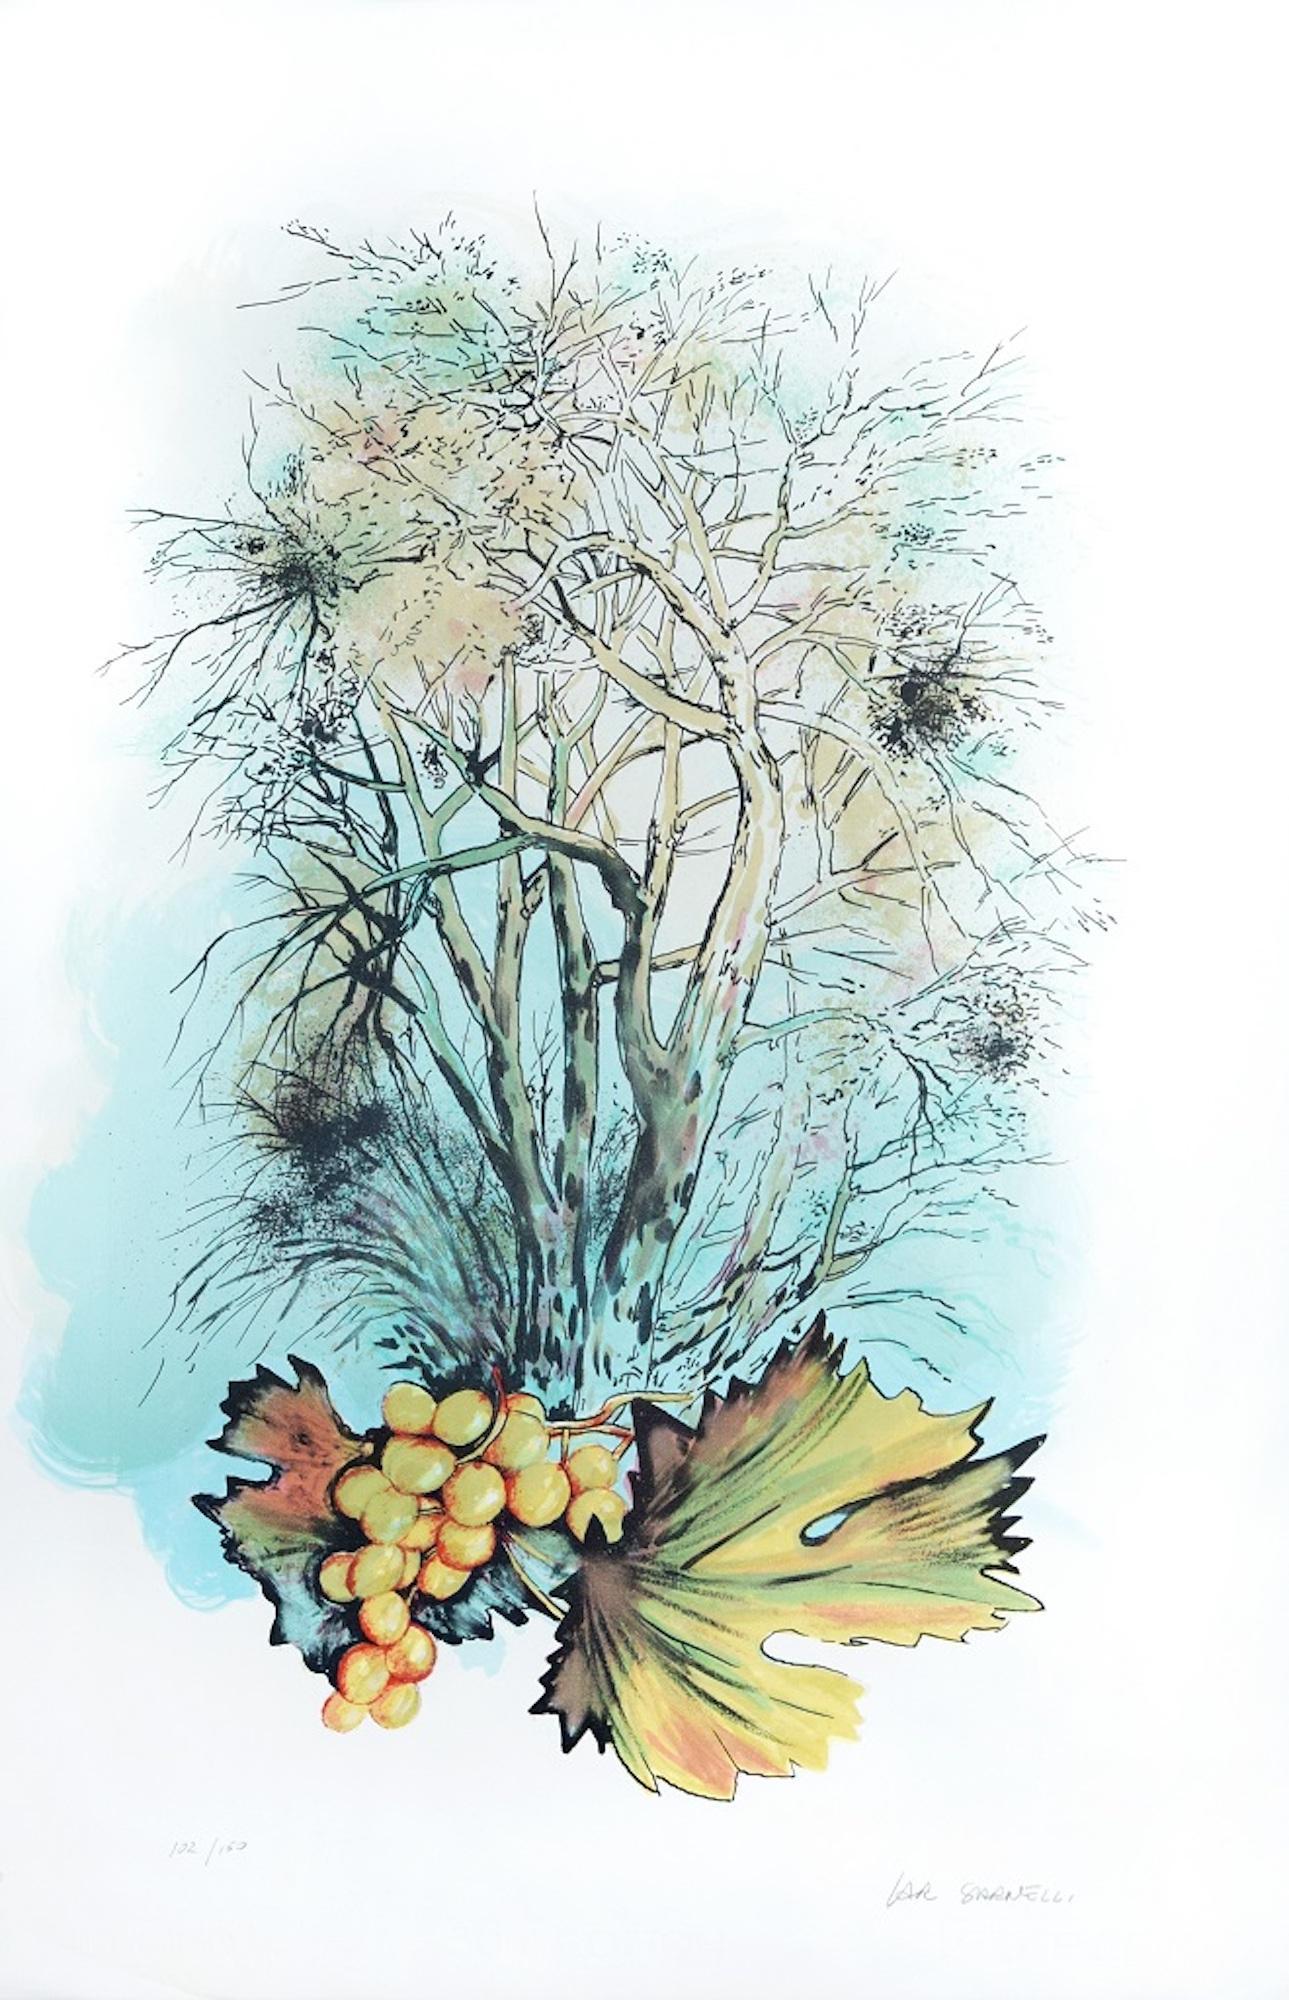 The Garden - Original Lithograph by A. Russo Sarnelli - 1990s